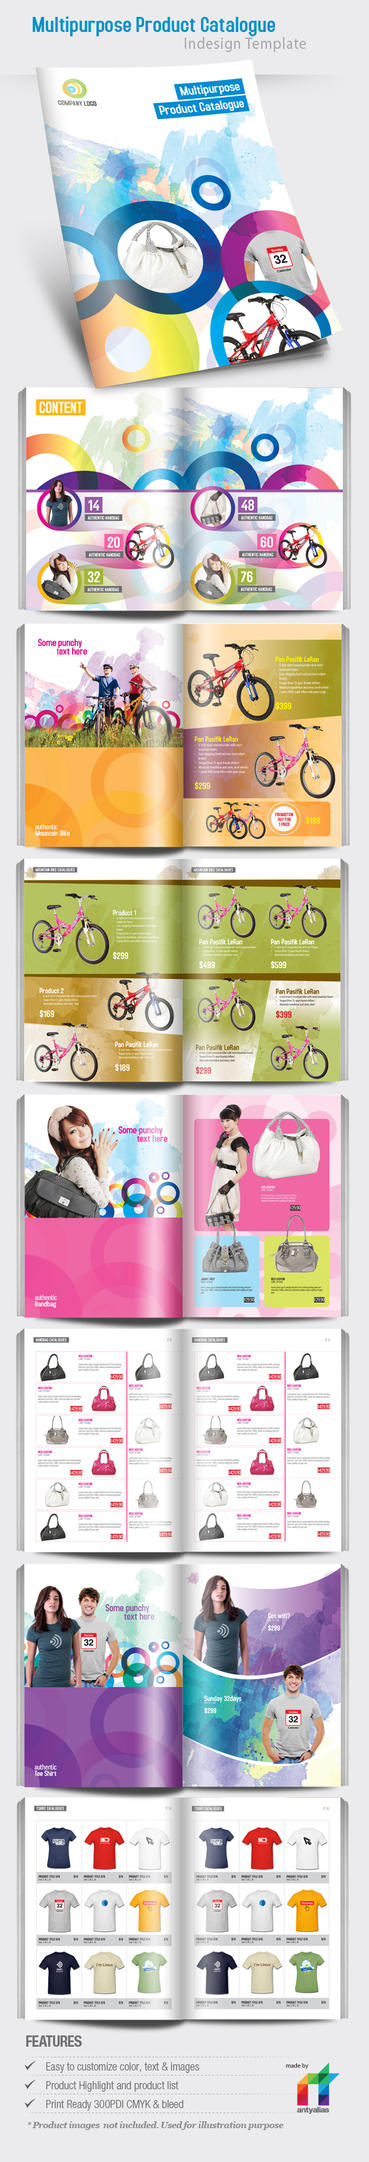 Mutipurpose Product Catalog by antyalias